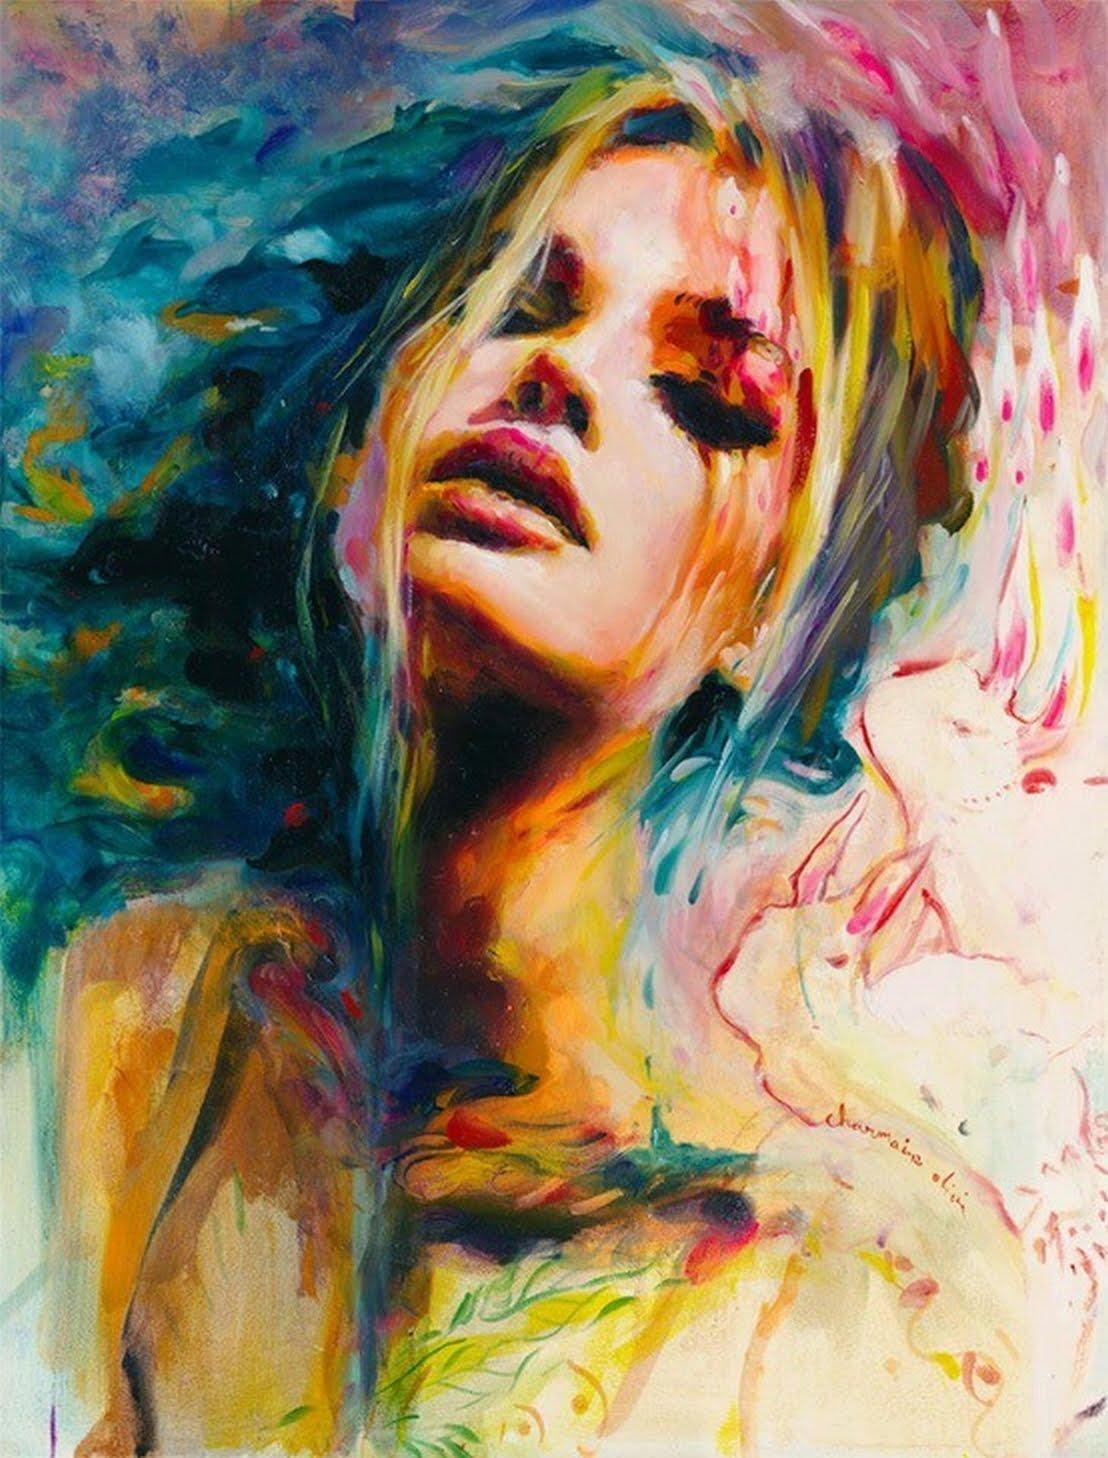 100% Handmade canvas painting beautiful women painting